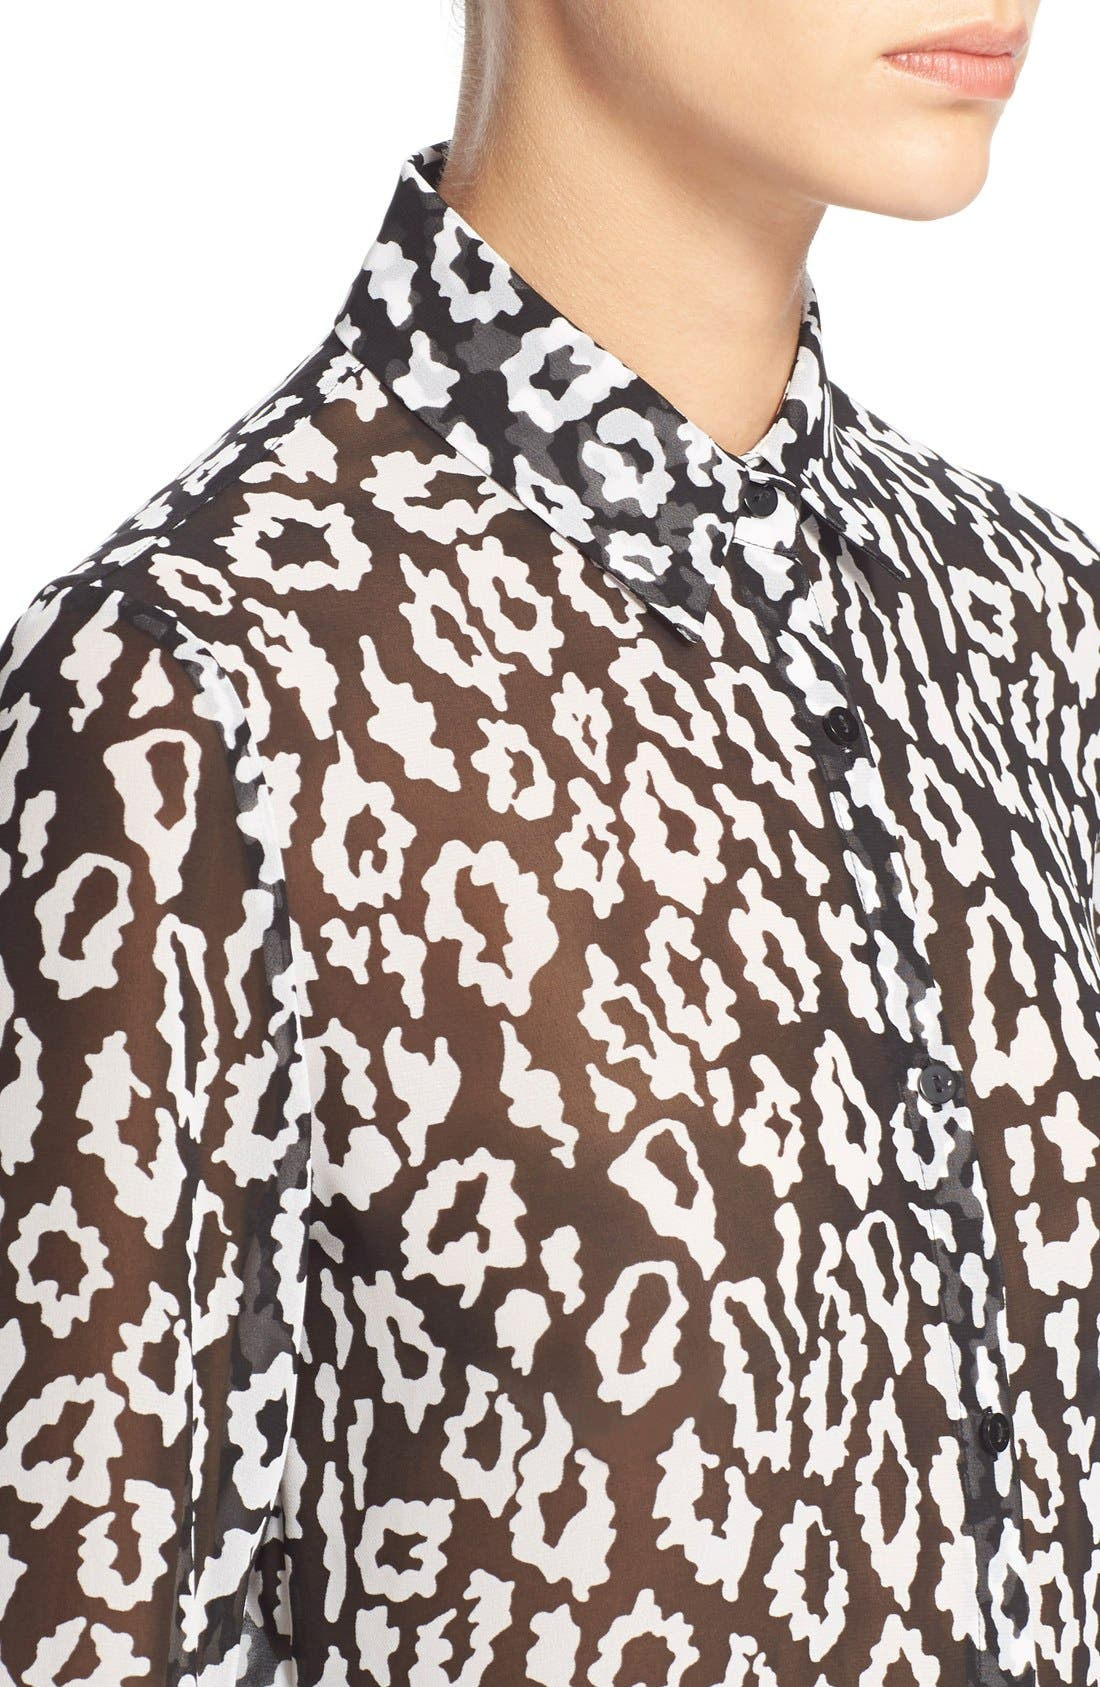 Leopard Print ChiffonShirt,                             Alternate thumbnail 4, color,                             005